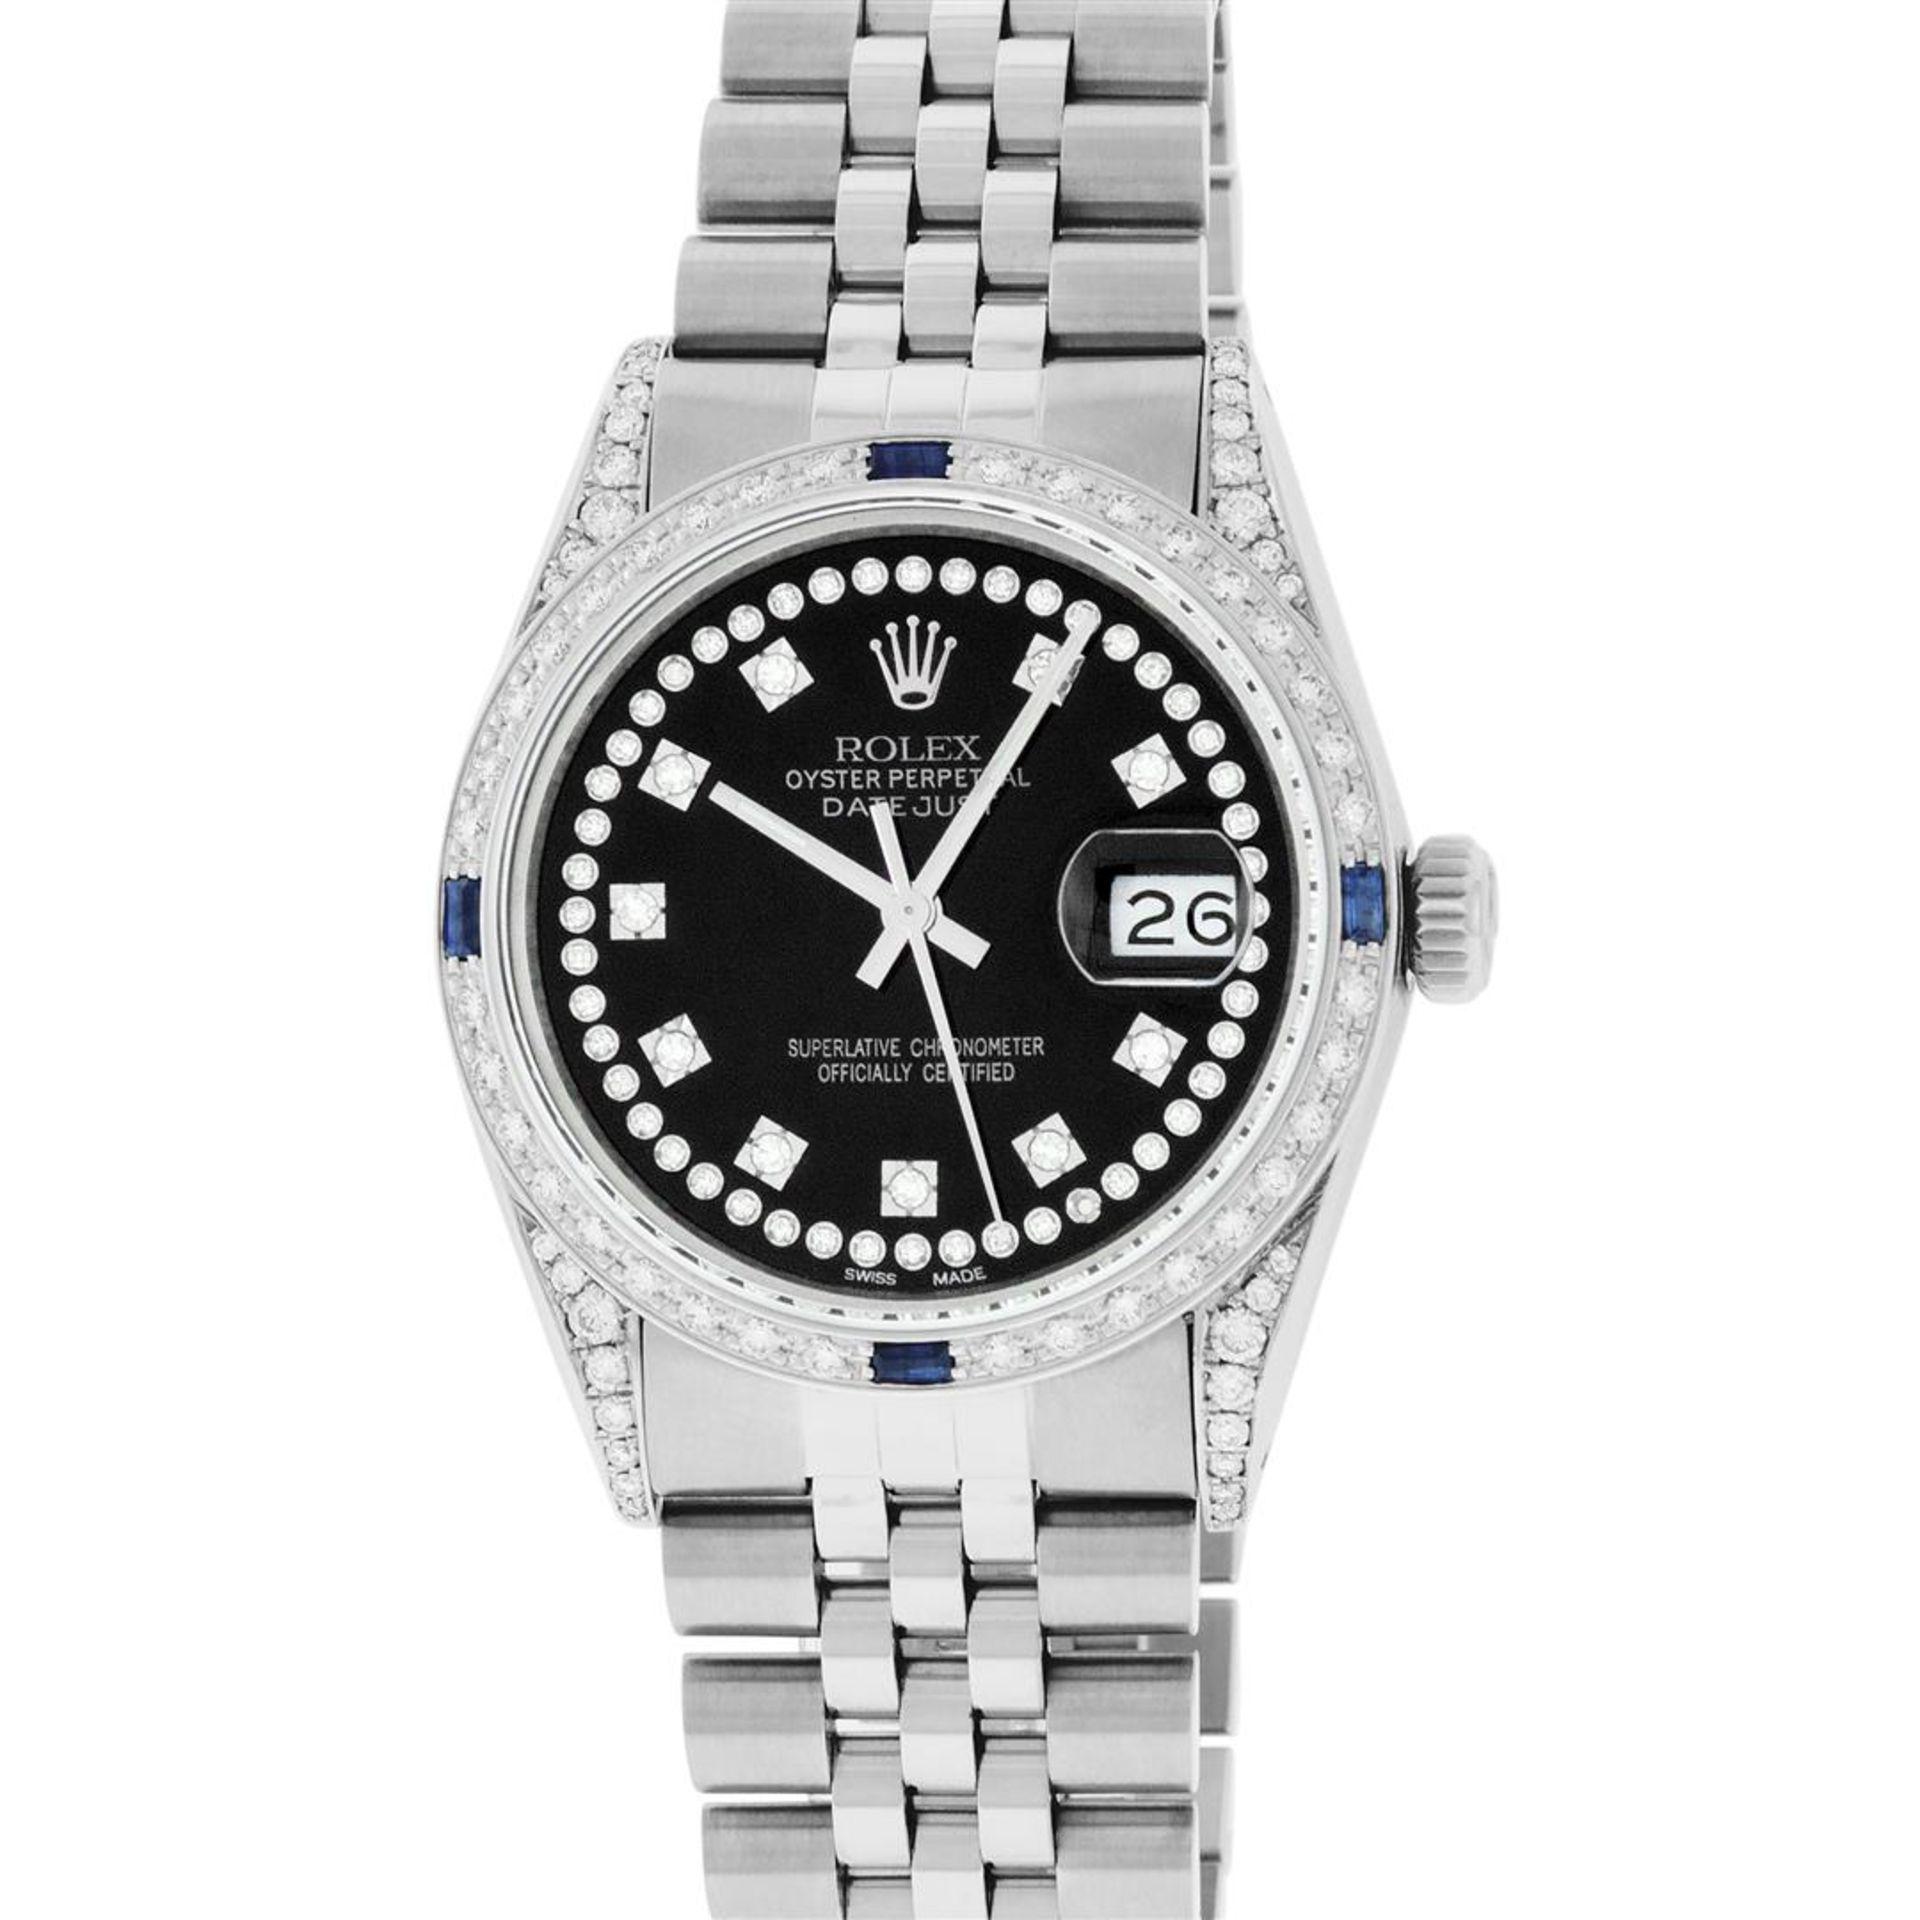 Rolex Mens Stainless Steel Black Diamond Lugs & Sapphire Datejust Wristwatch Oys